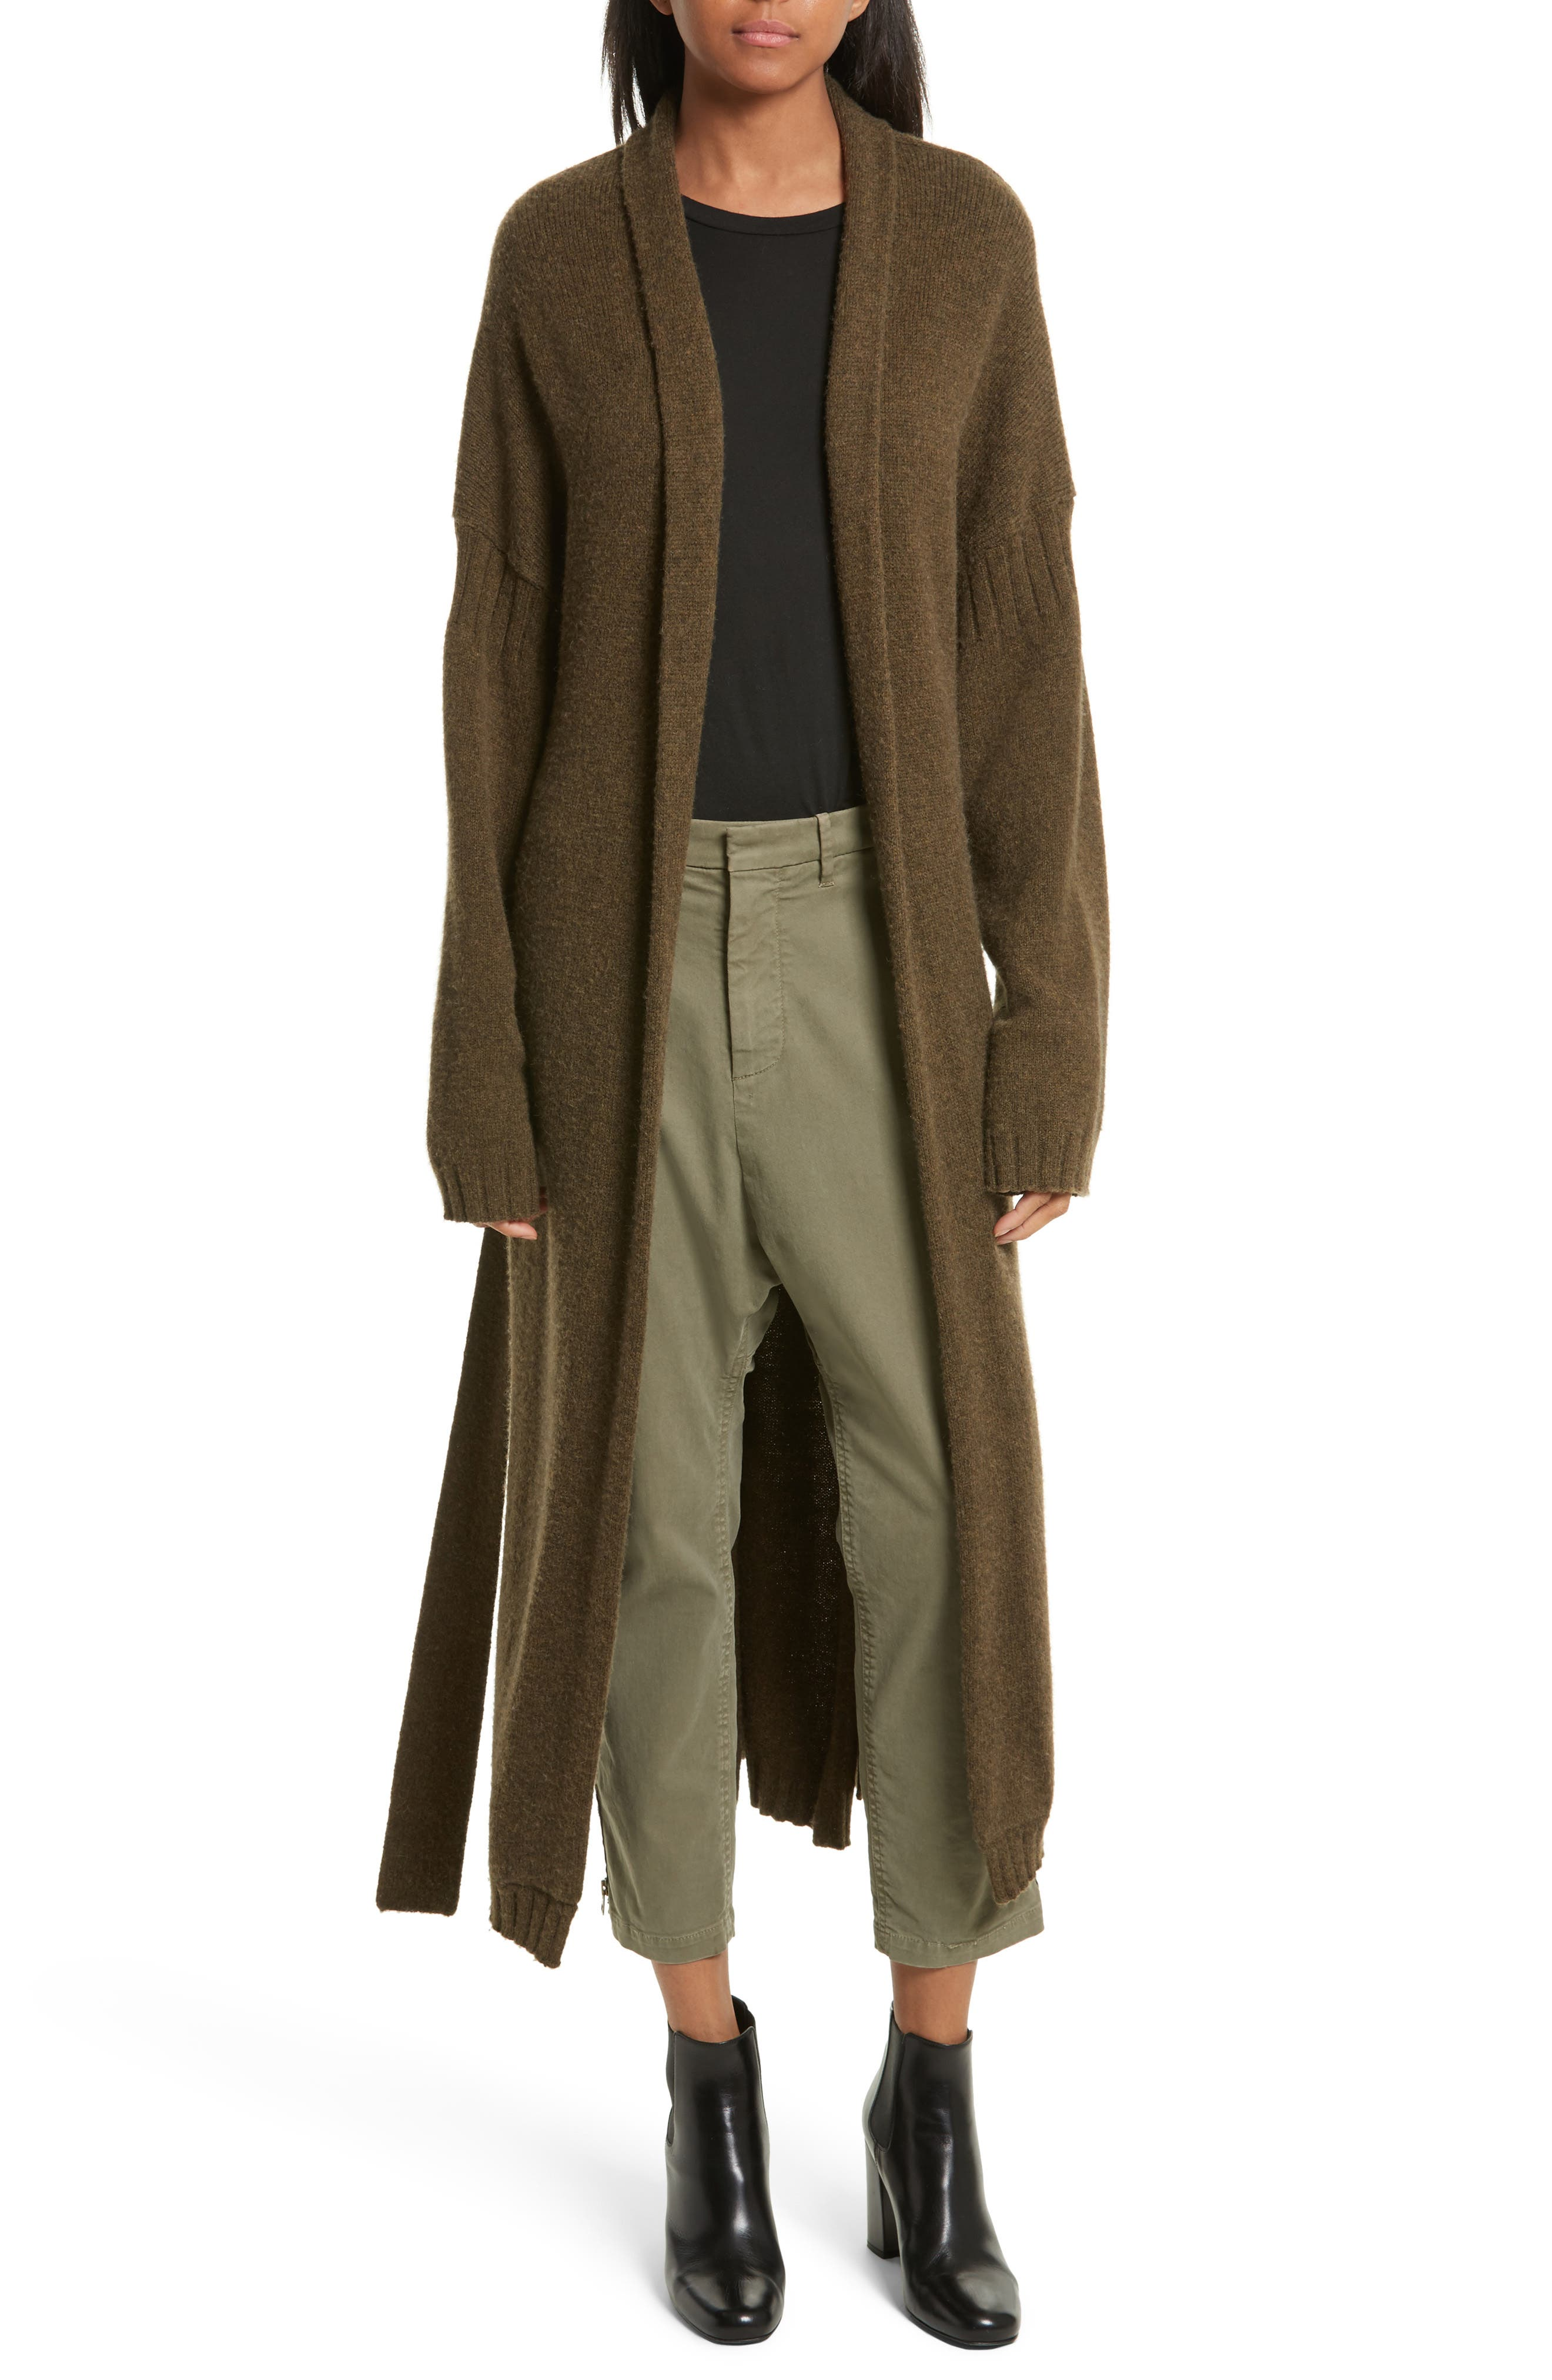 Kinsley Merino Wool Blend Cardigan,                             Main thumbnail 1, color,                             Army Green